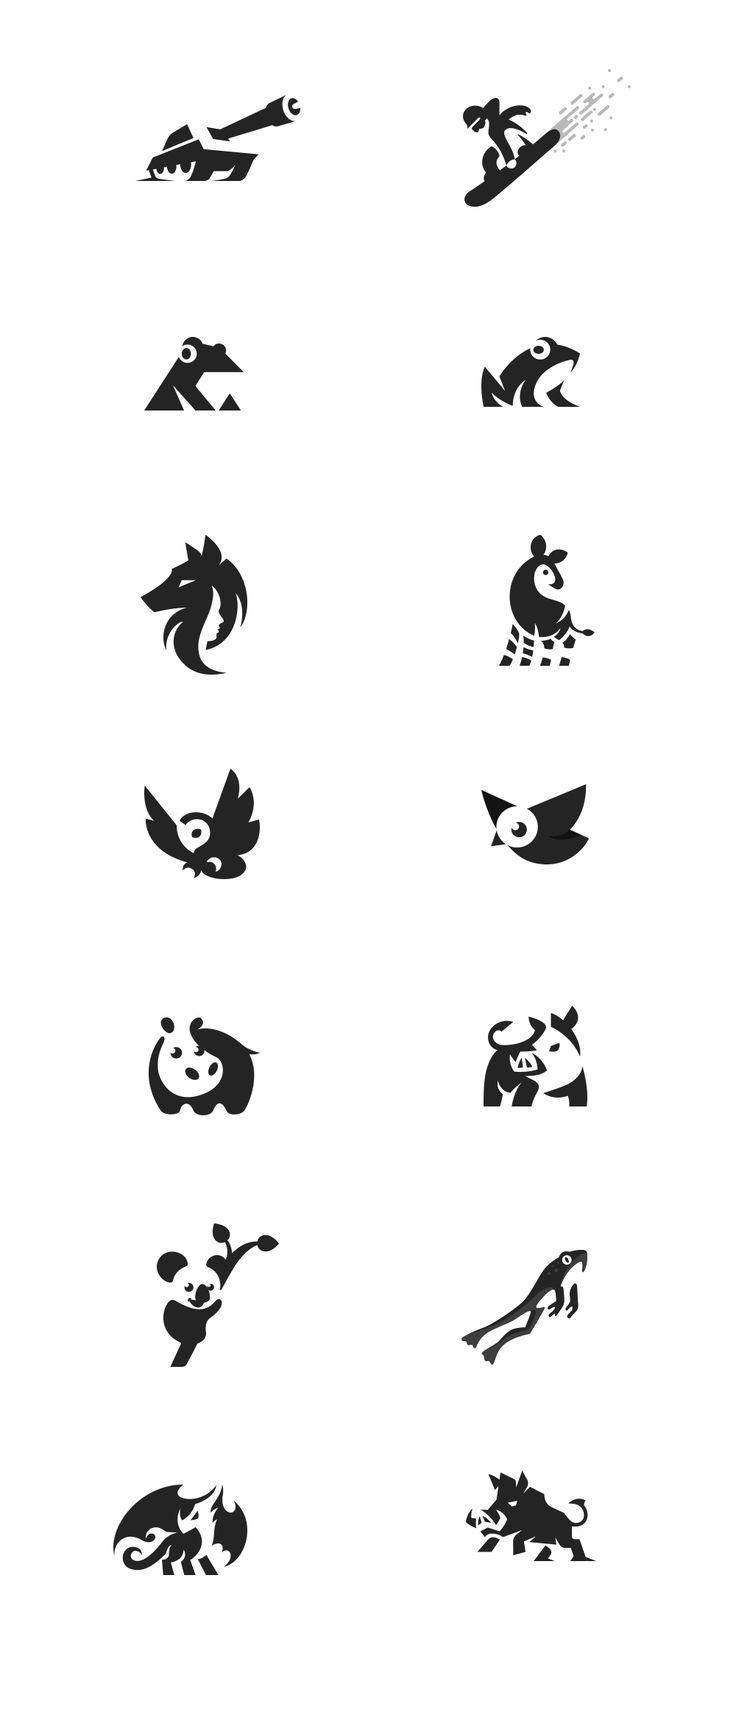 Minimalismo contraforma síntese de animais http://jrstudioweb.com/diseno-grafico/diseno-de-logotipos/